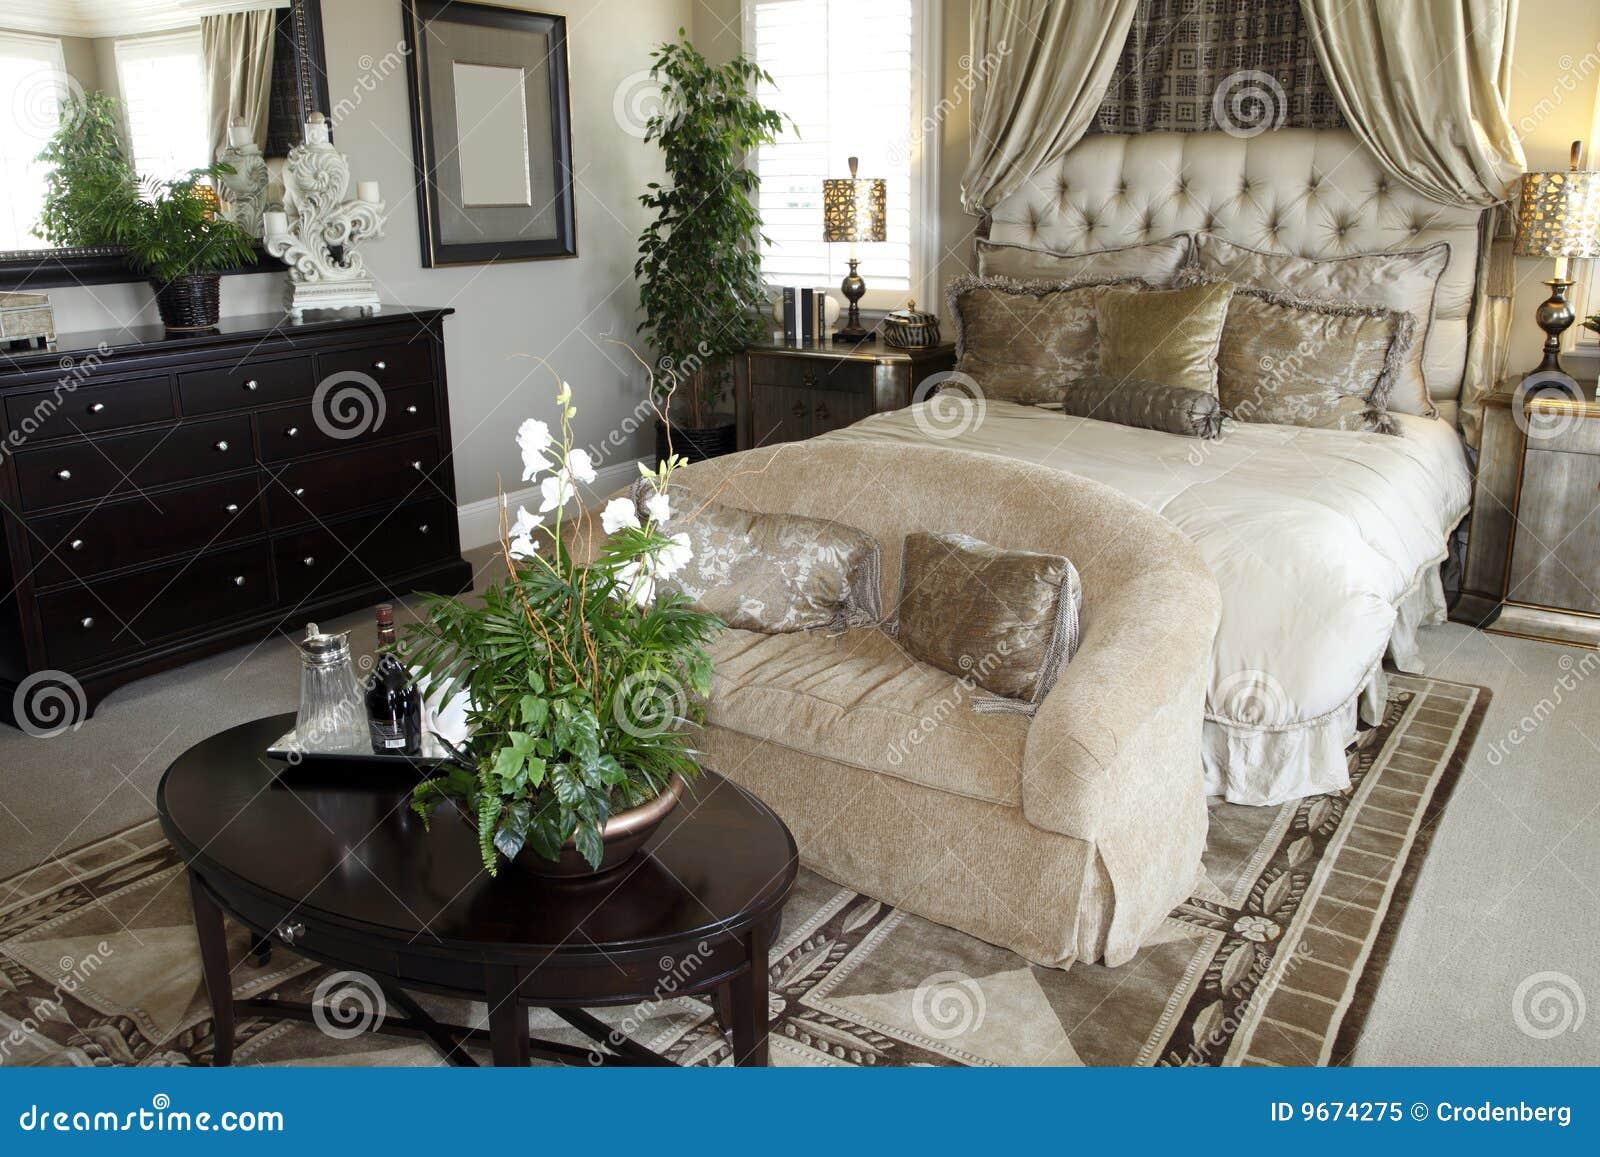 404 not found - Chambre a coucher de luxe moderne ...